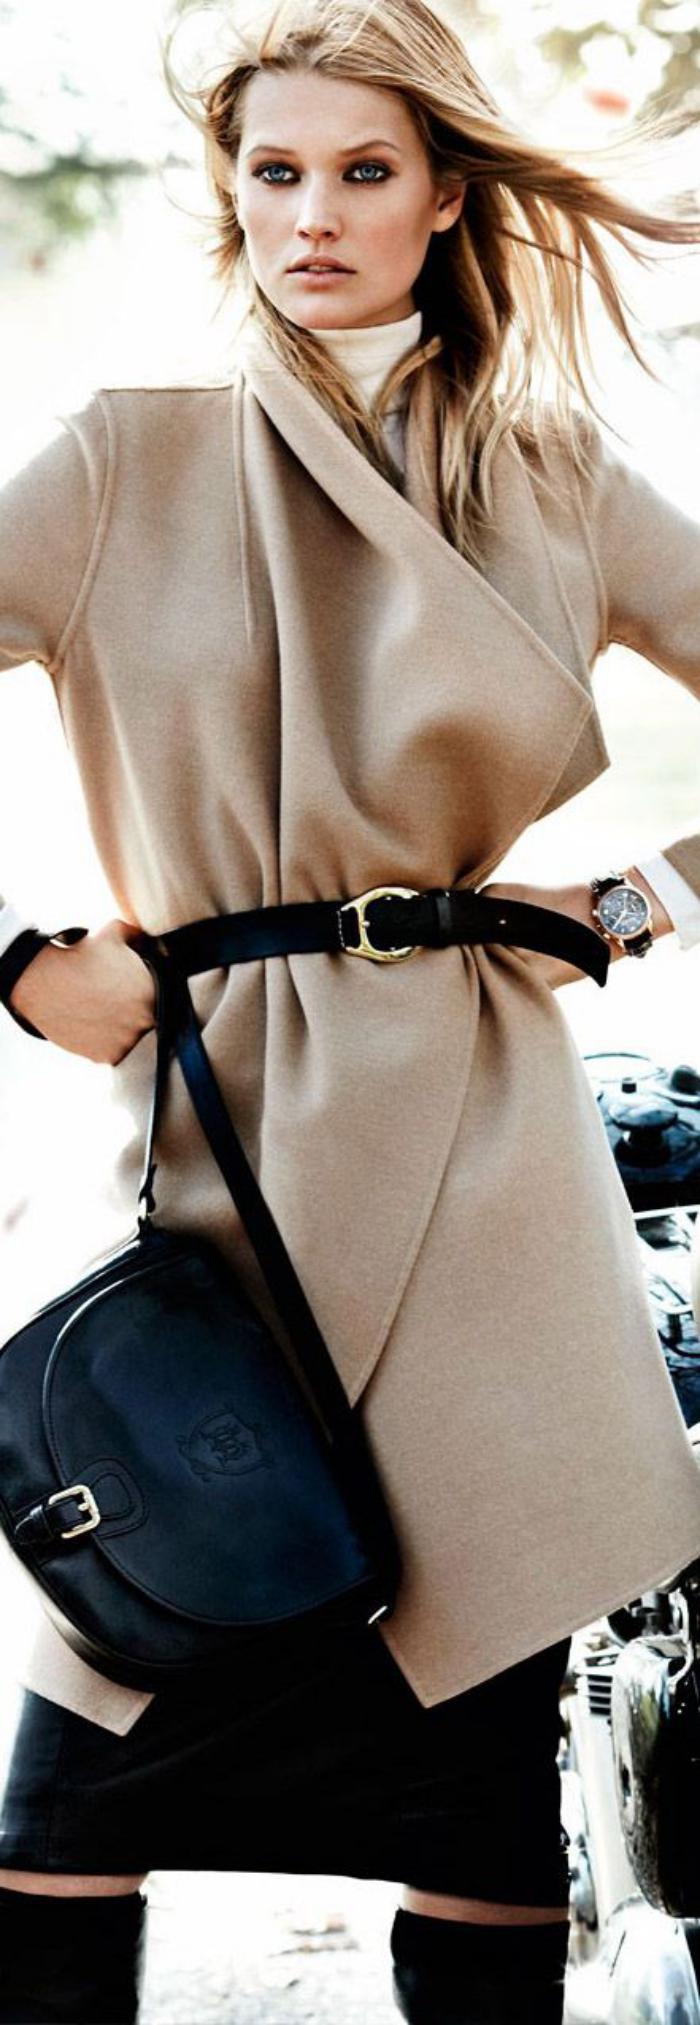 weibliches-Modell-Mantel-Karamell-Farbe-Gürtel